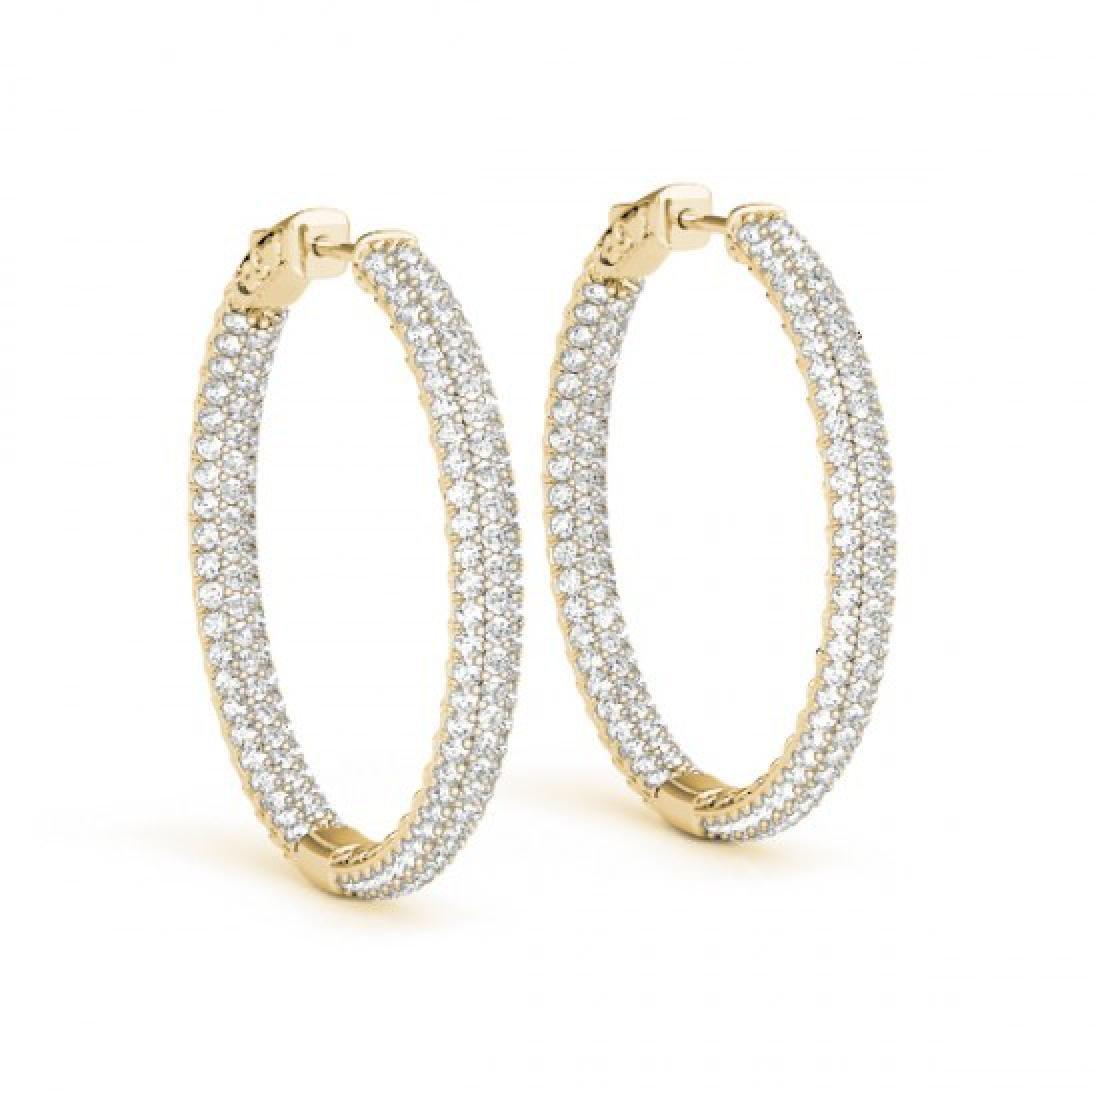 4.5 CTW Diamond VS/SI Certified 36 Mm Hoop Earrings 14K - 2